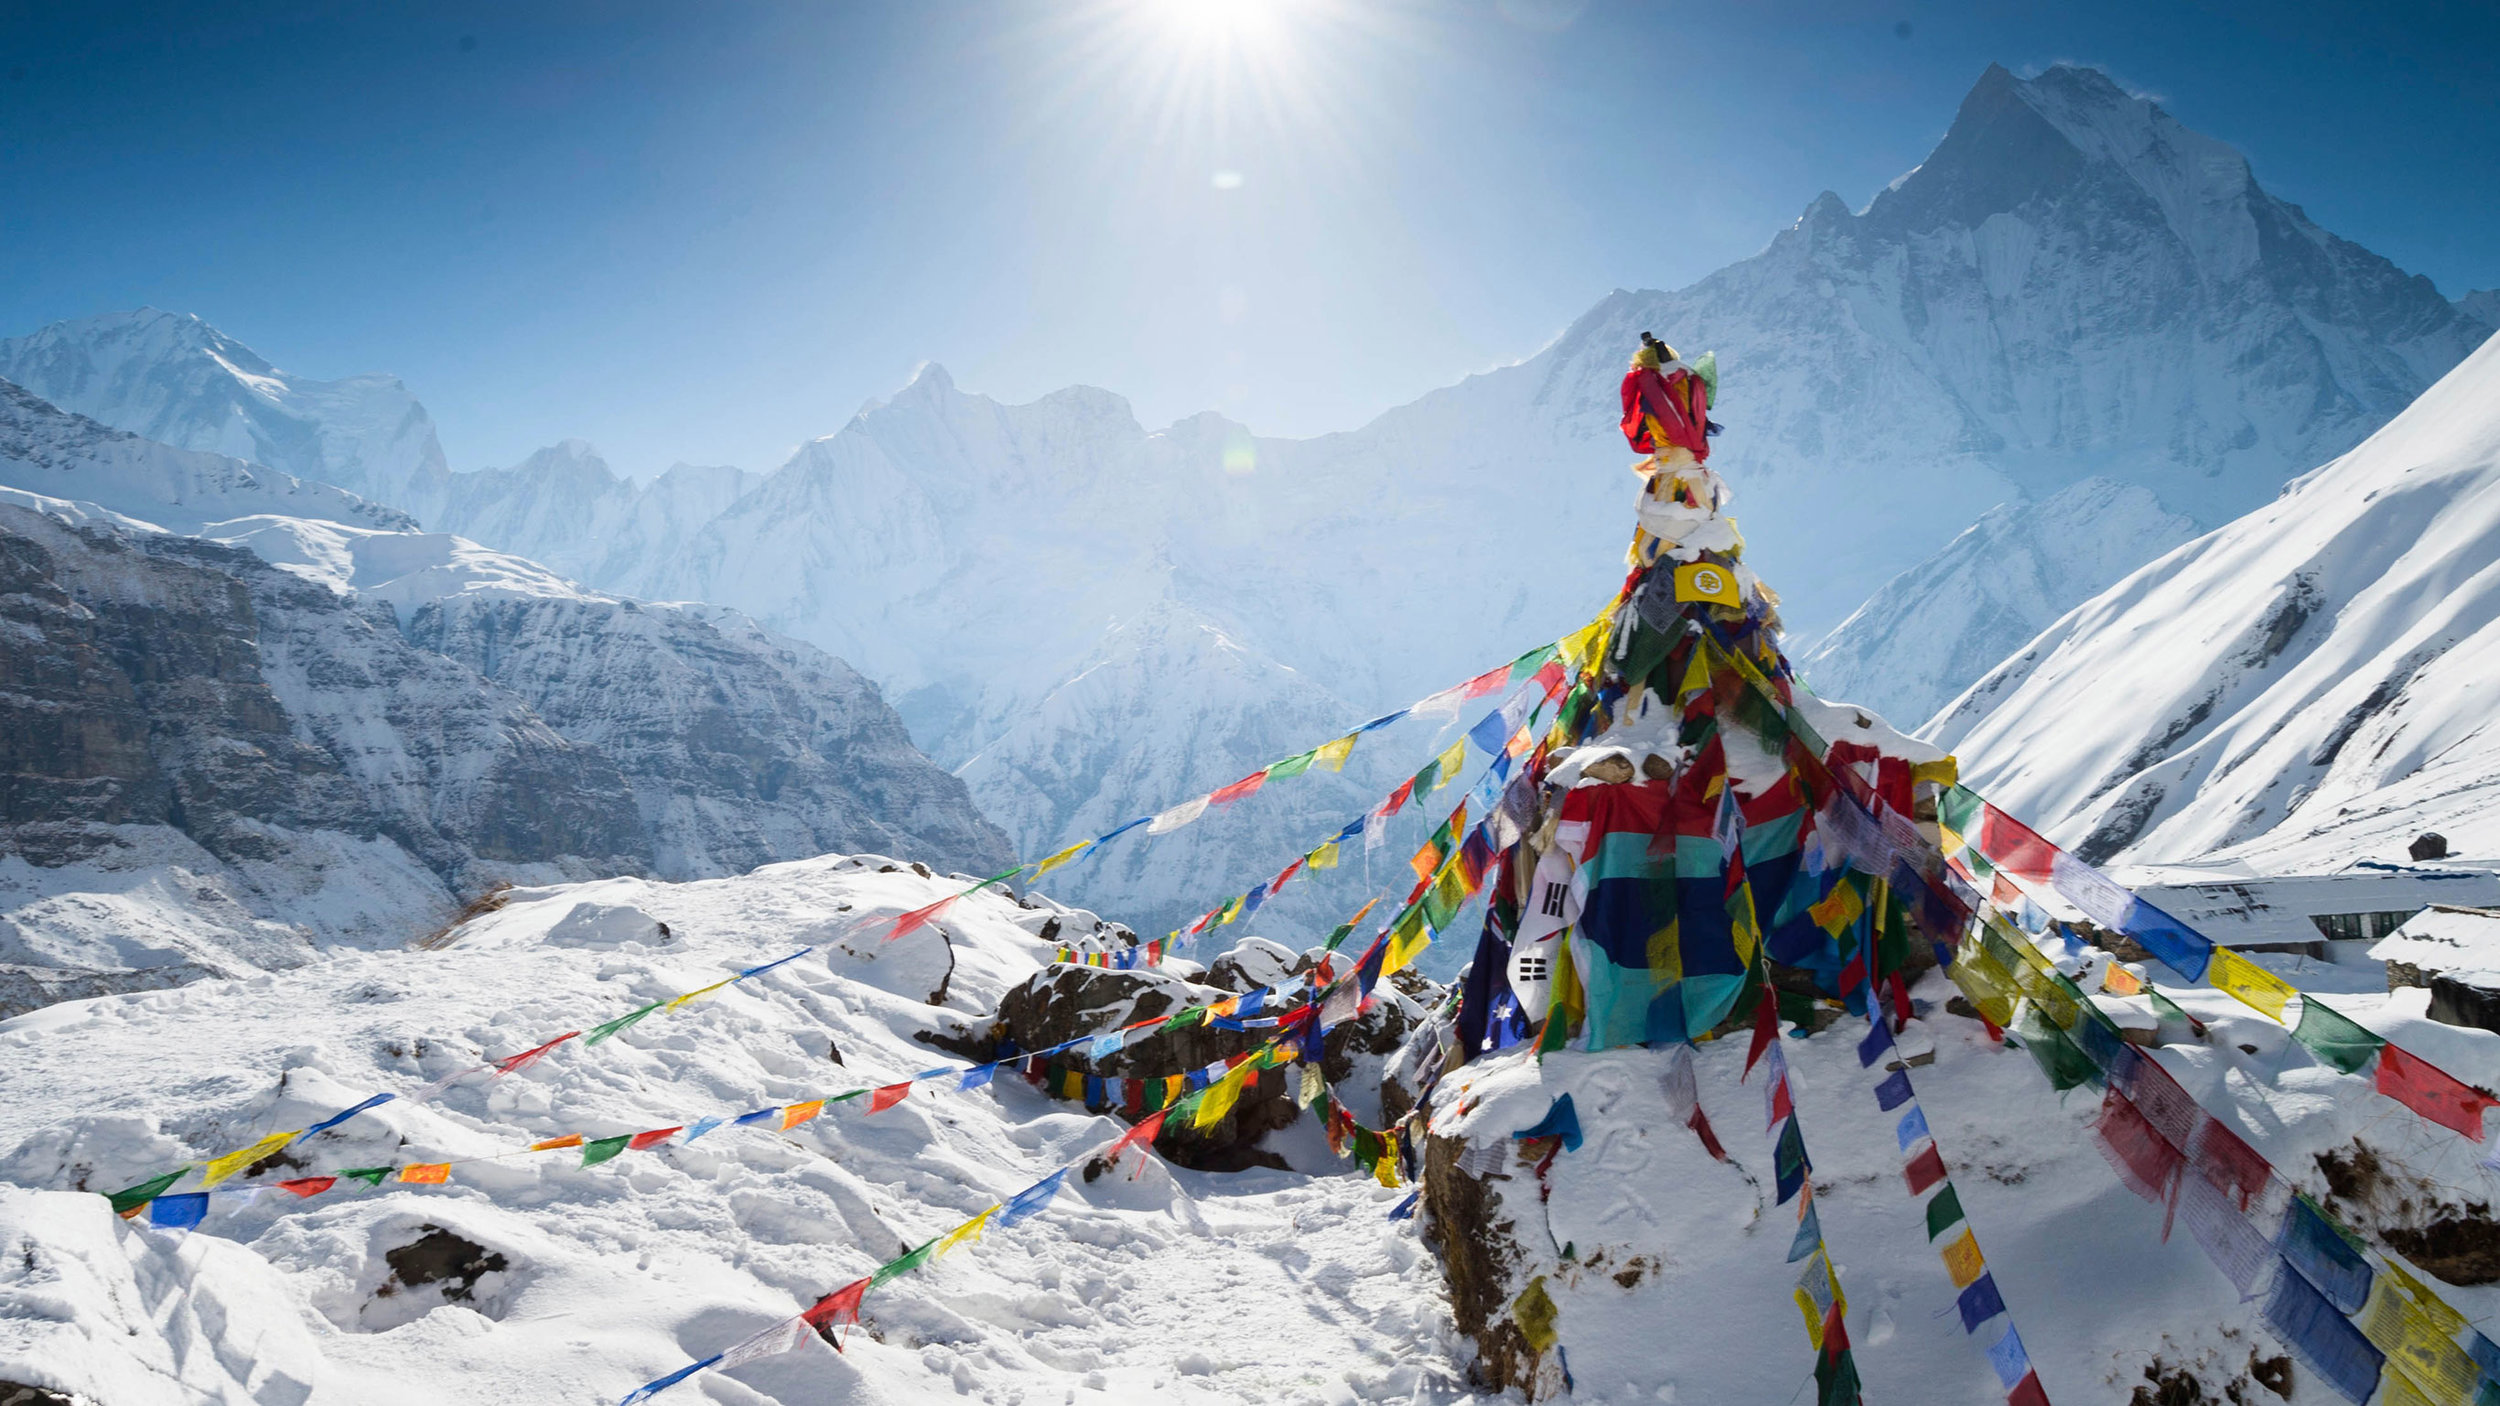 Nepal-Himalaya-Mountains-Annapurna-Pokhara-Prayer-Flags-IS-027332084-Lg-RGB.jpg